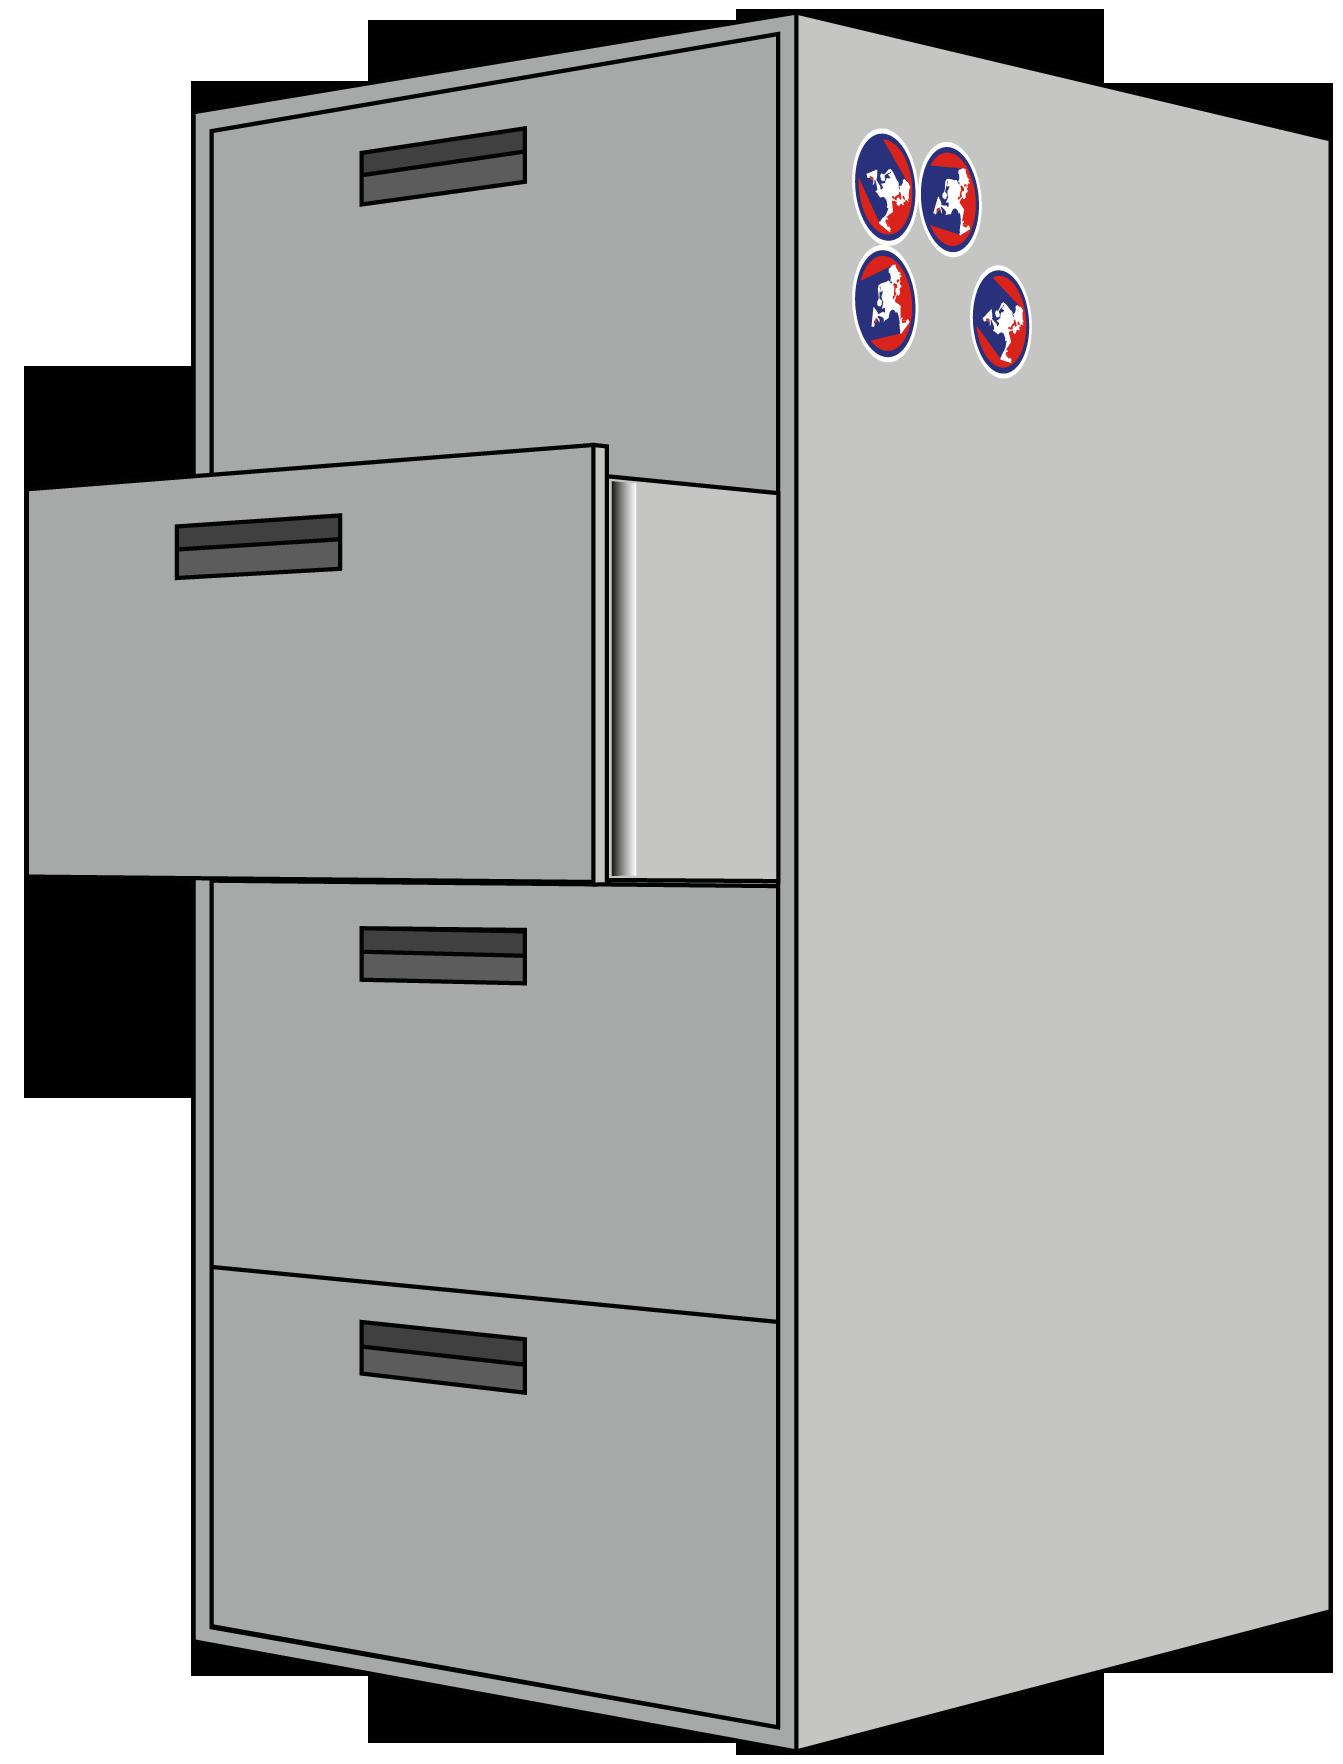 cabinet2_illustration